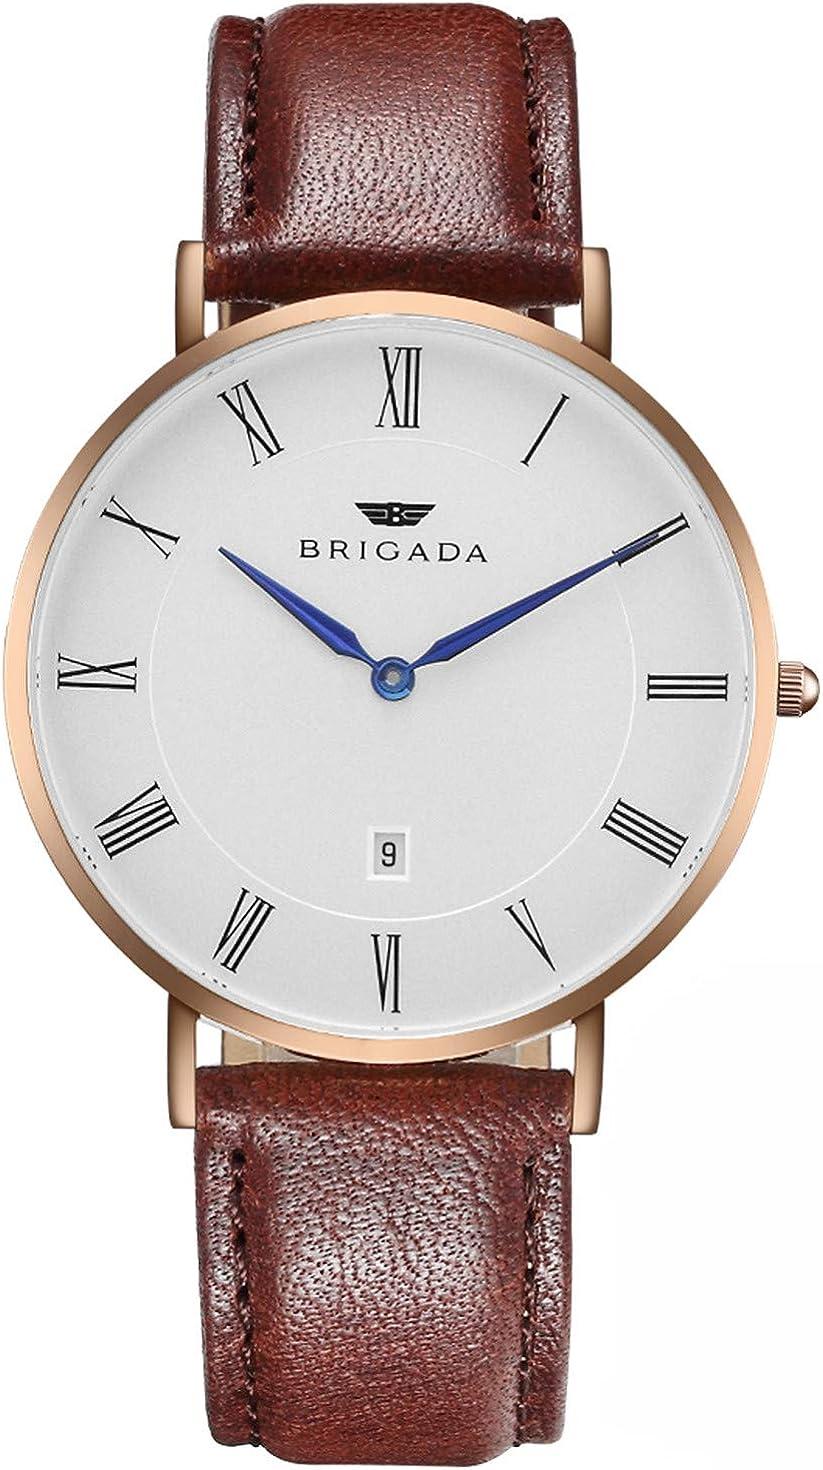 Buy Men's Watches Minimalist Fashion Business Casual Waterproof Quartz  Wrist Watch for Men Women Swiss Brand Online in Taiwan. B01DDG0ABG